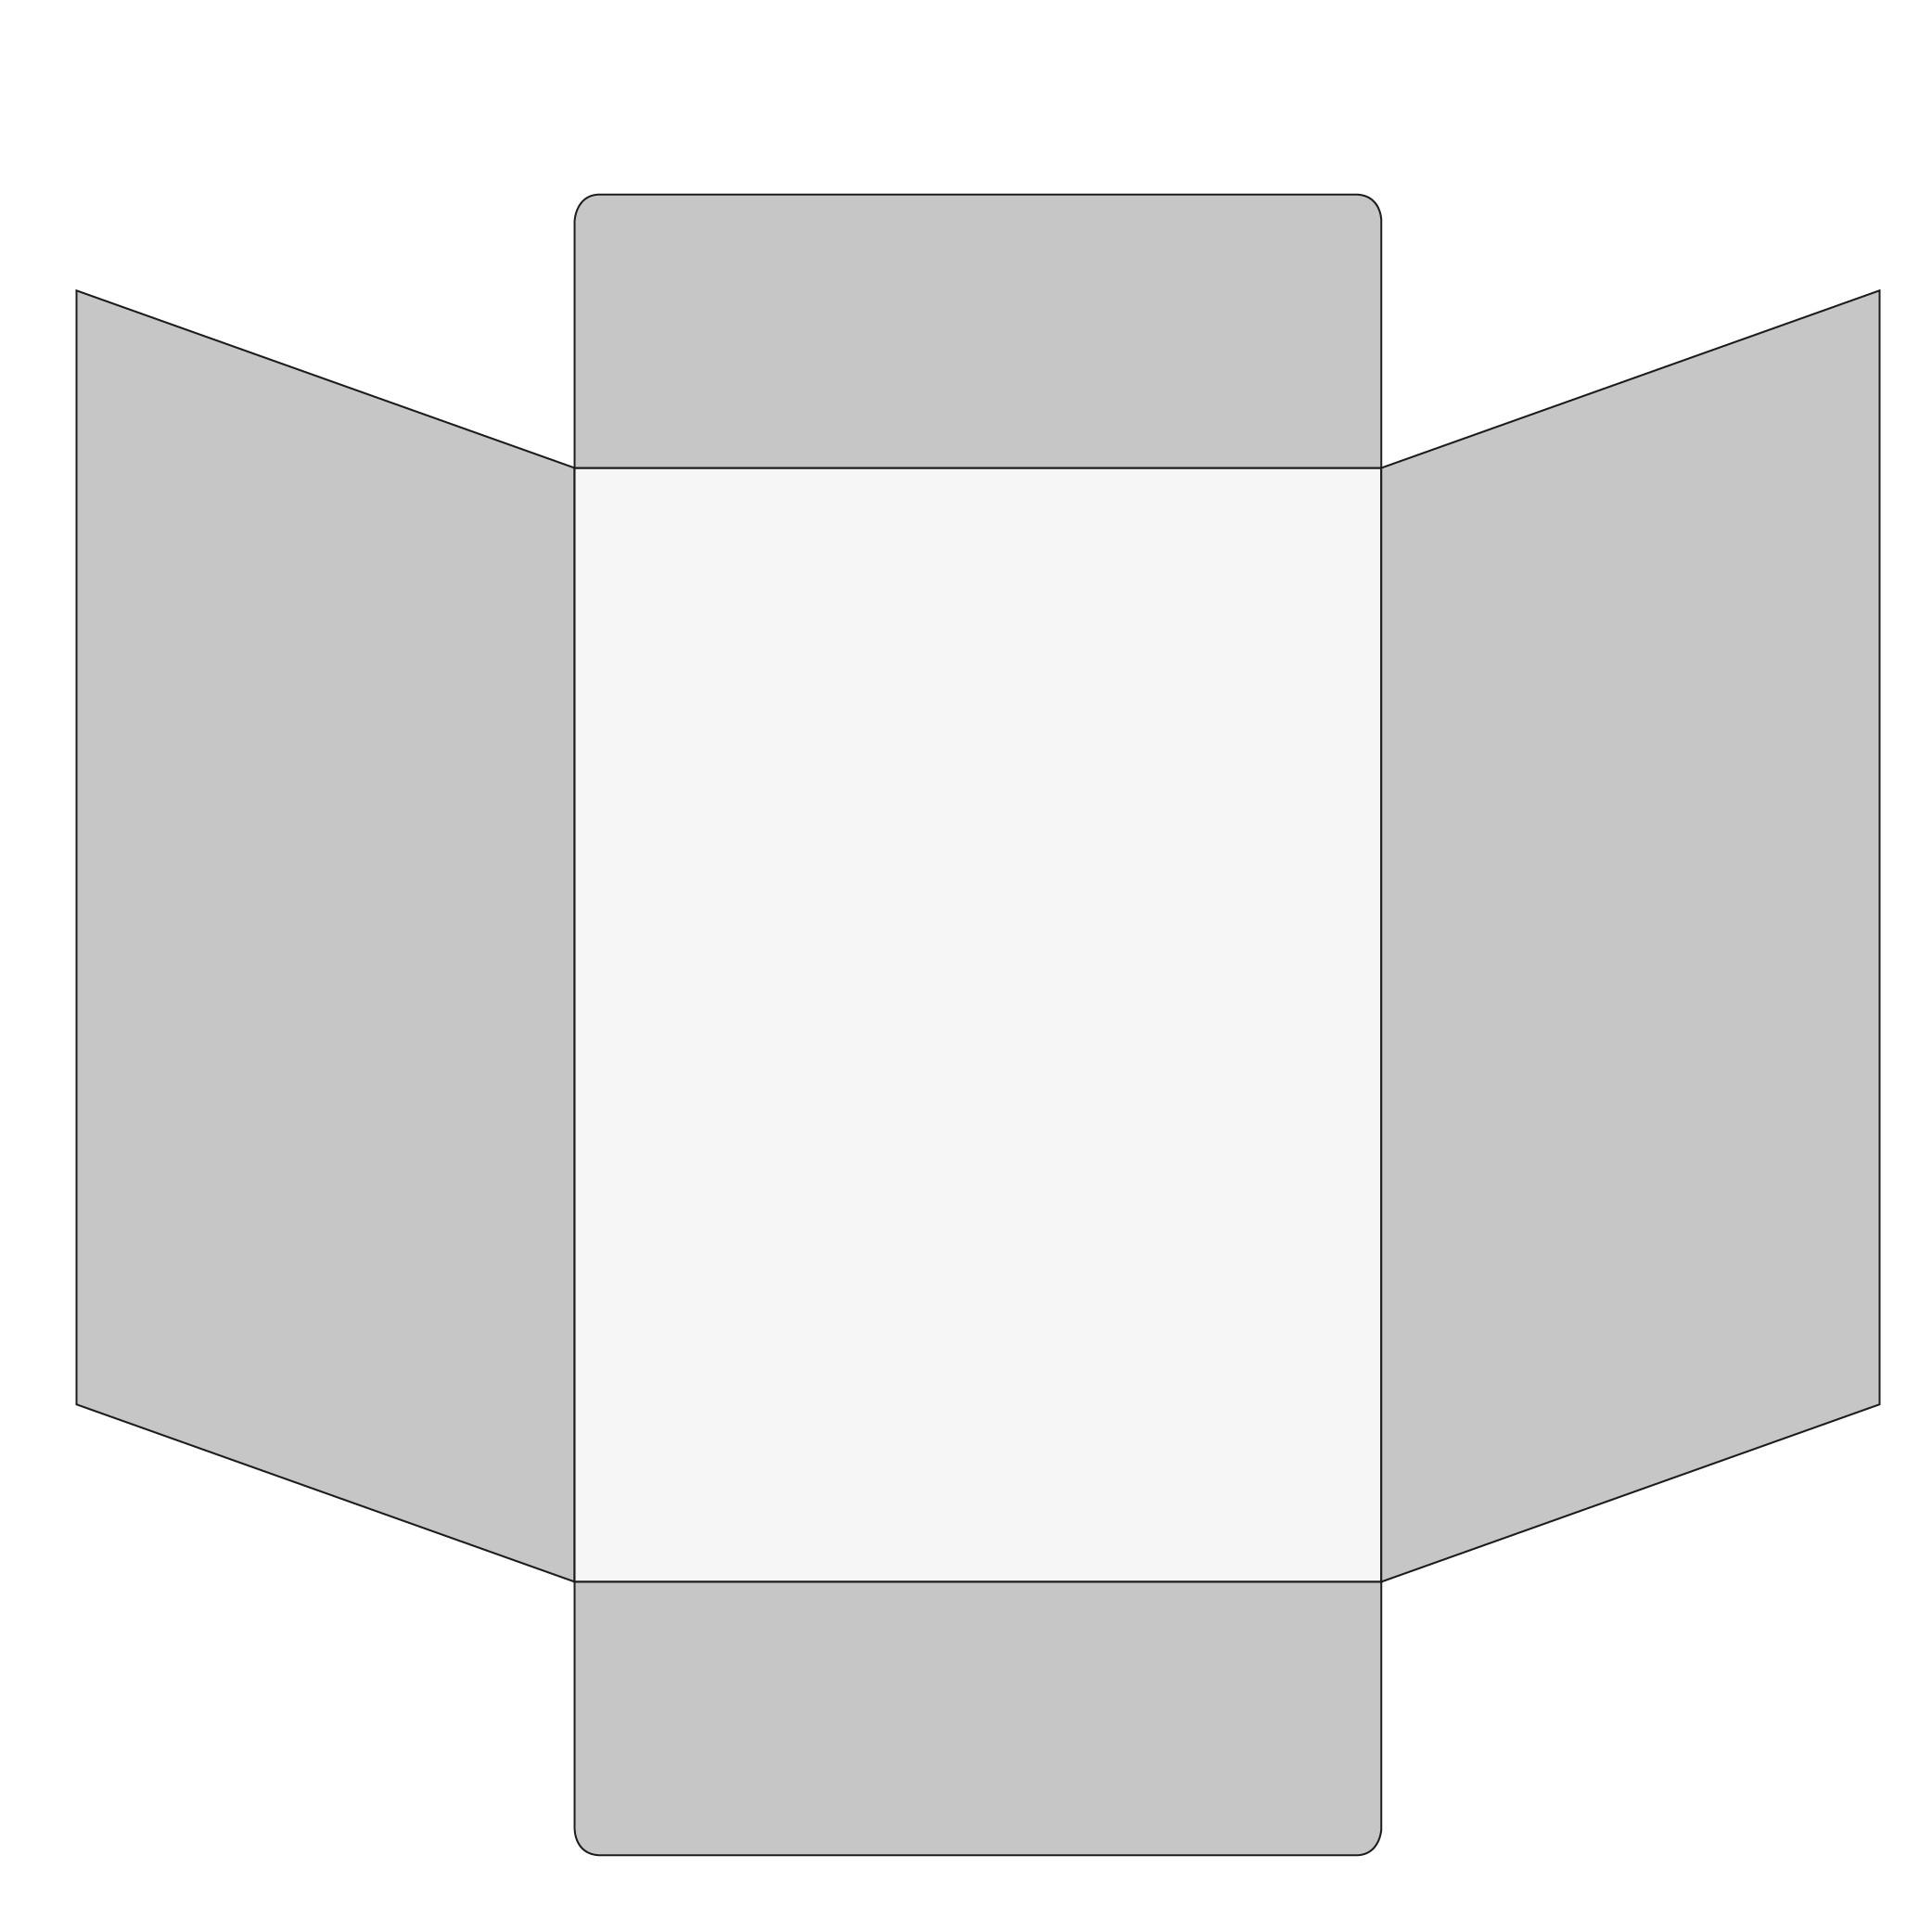 cartella Cartella A4 - 3 lembi